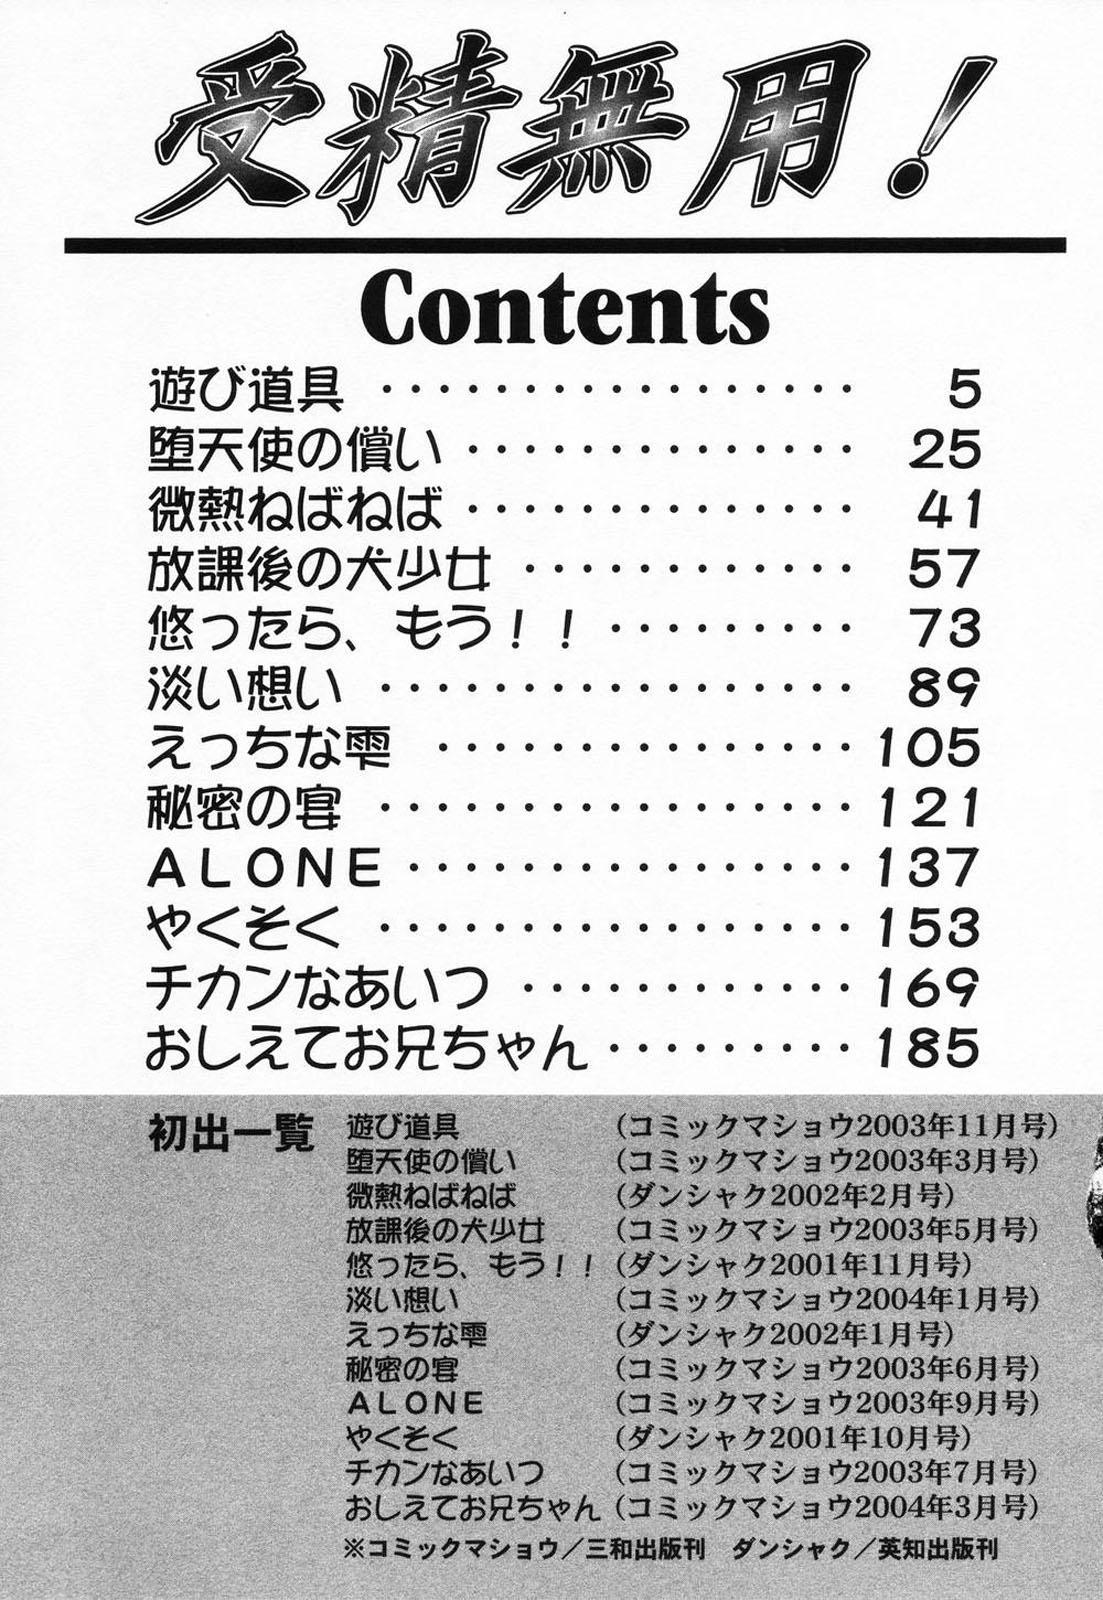 Jusei Muyou! 199